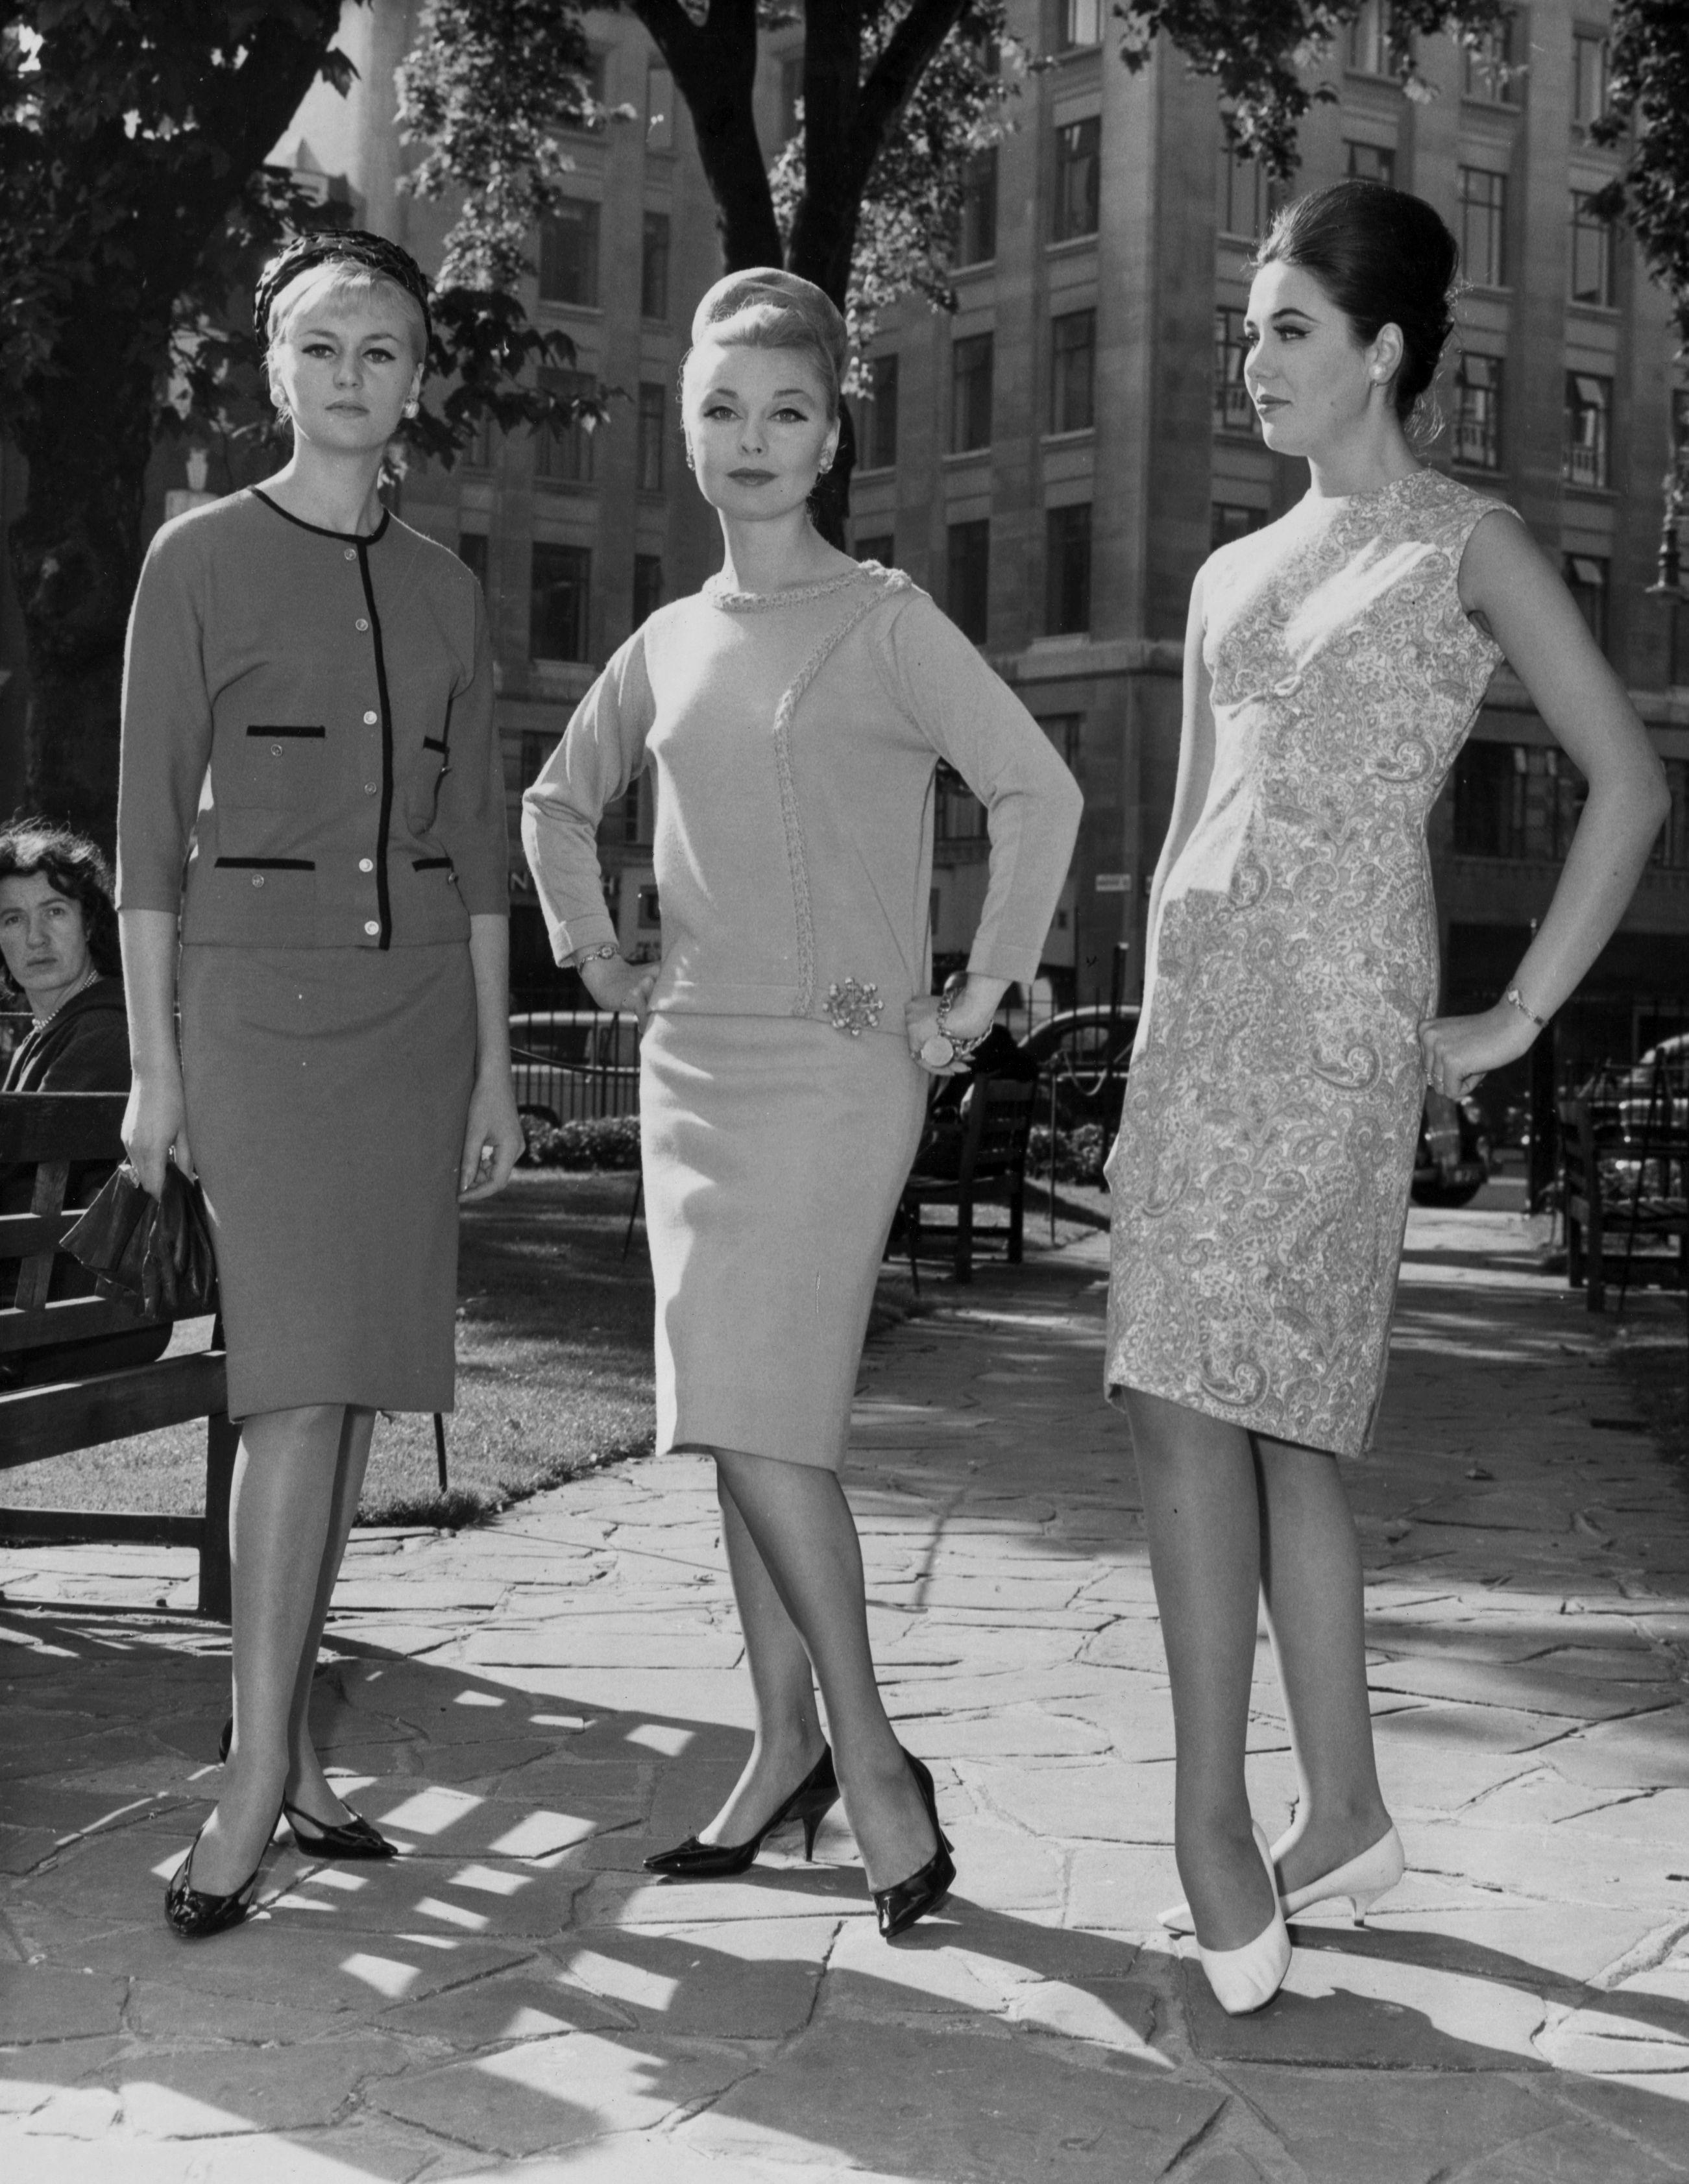 Early 1960s fashion men